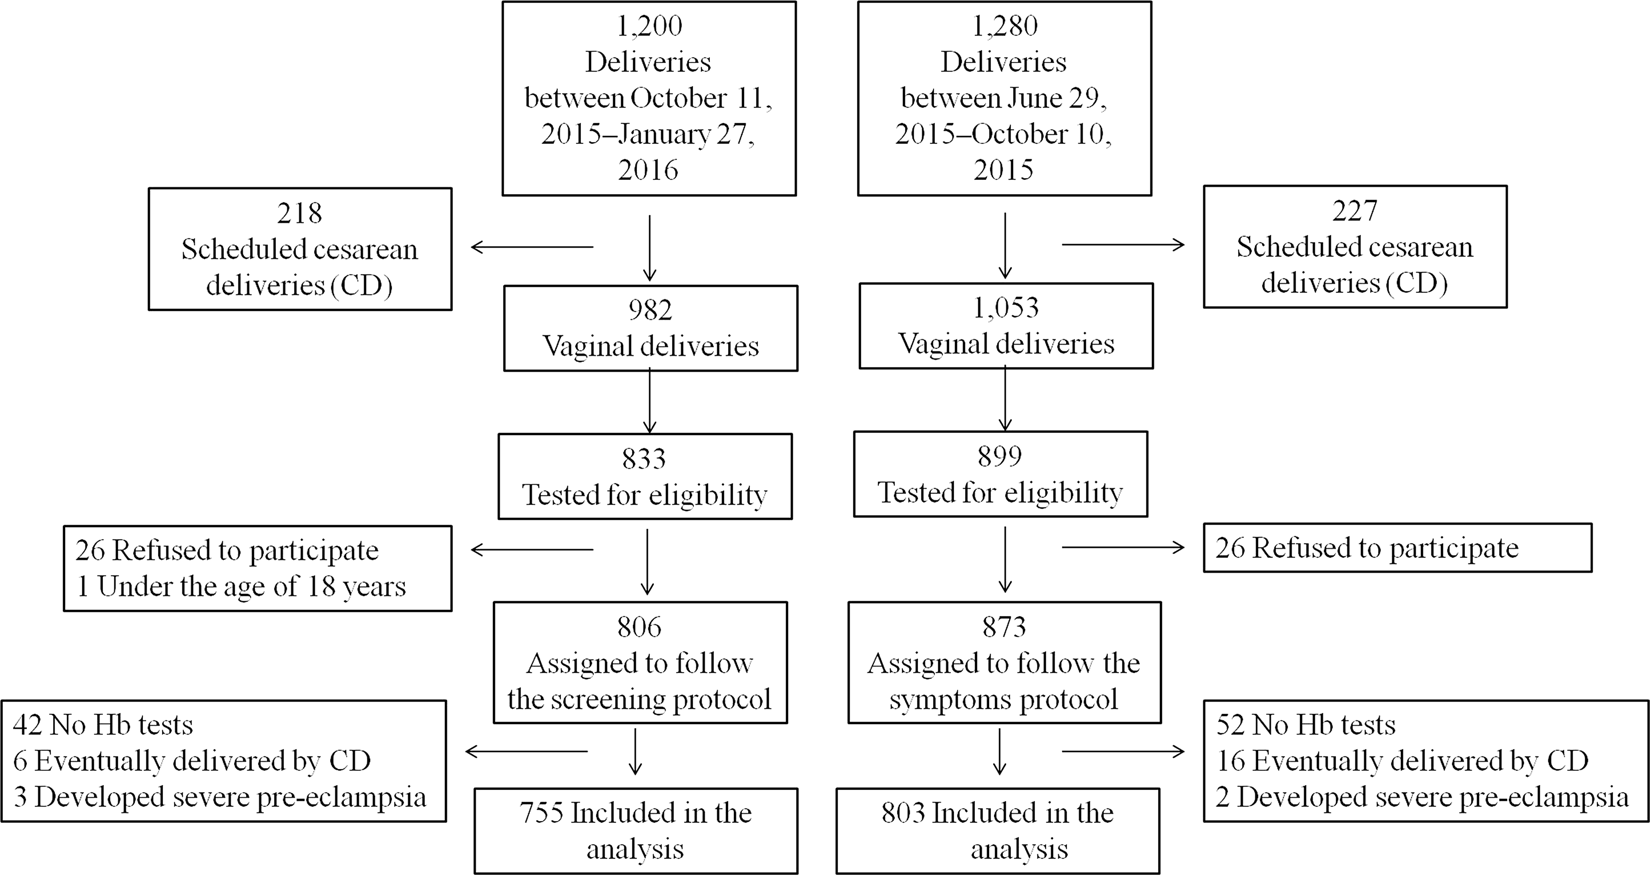 Evaluation of postpartum anaemia screening to improve